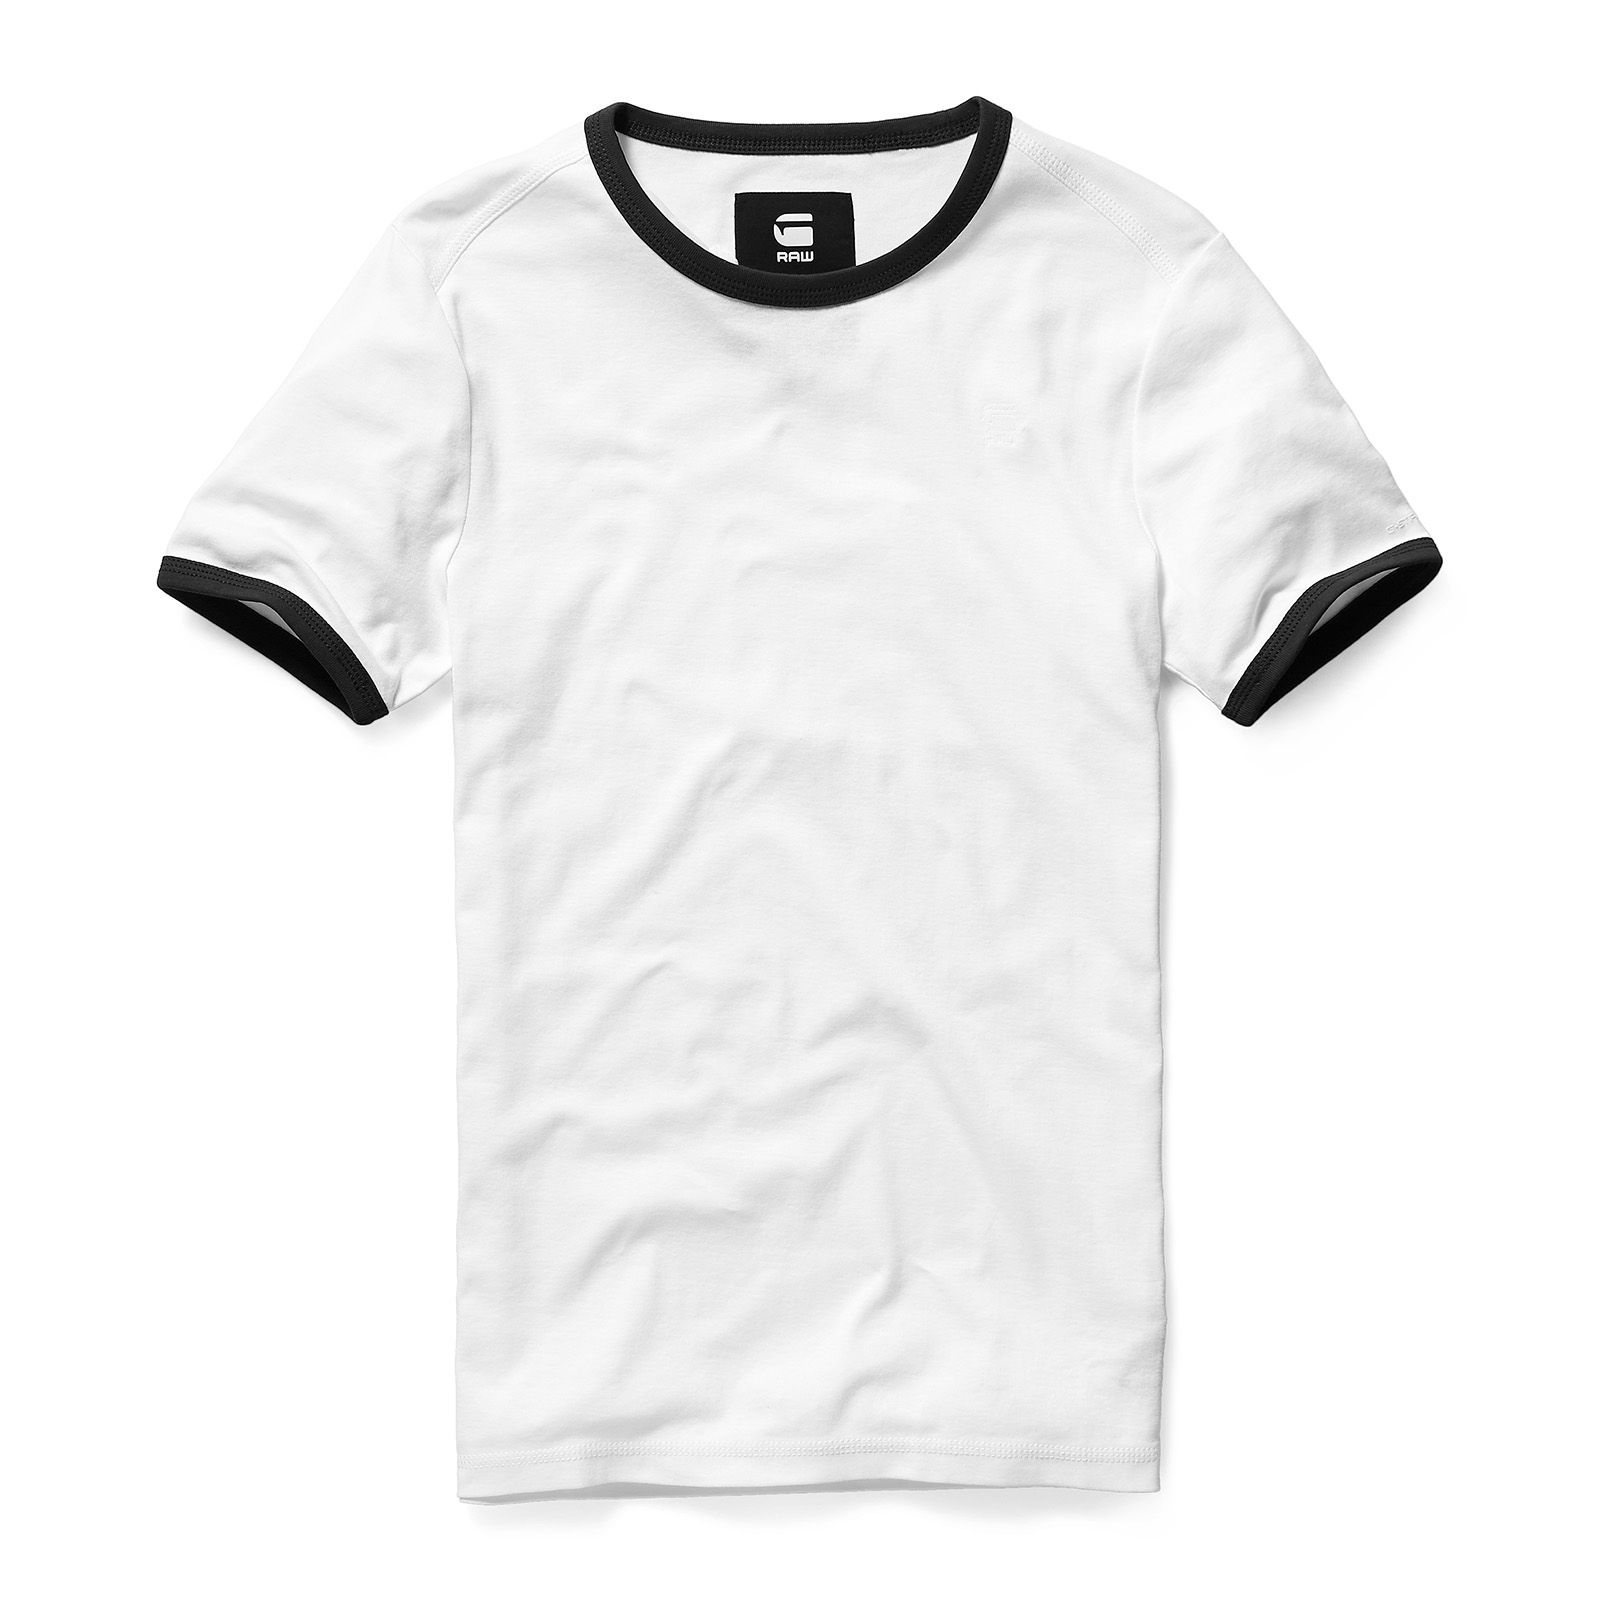 Ramic Contrast Short Sleeve Tshirt Pakaian pria